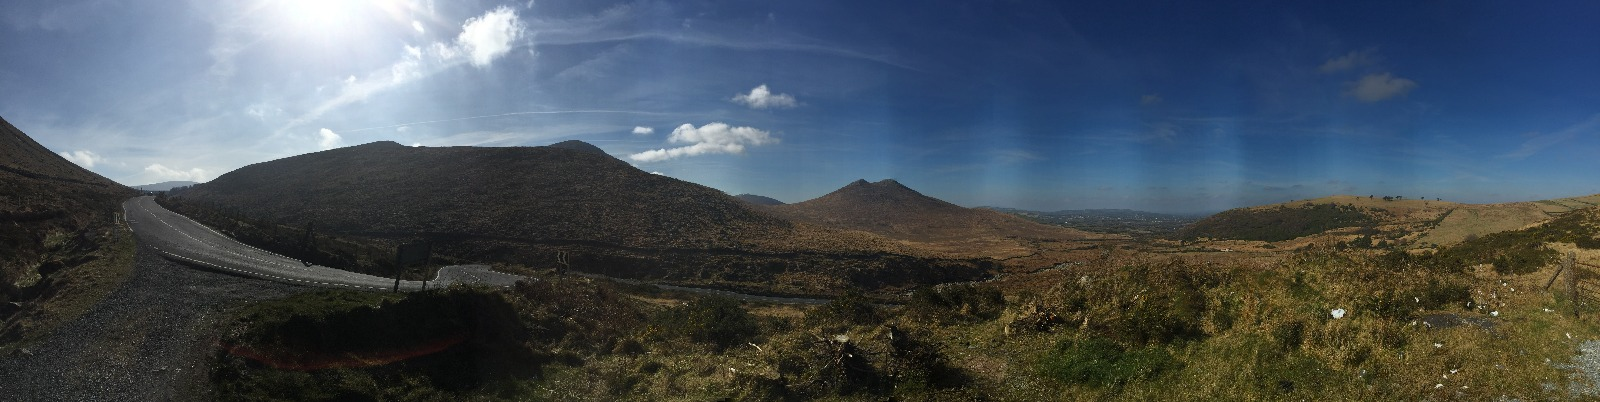 bluesky_panoramic_kilkeel_road_silent_valley_spelga_damn_mourne_mountains_ni_explorer_niexplorer_northern_ireland_blog.jpg